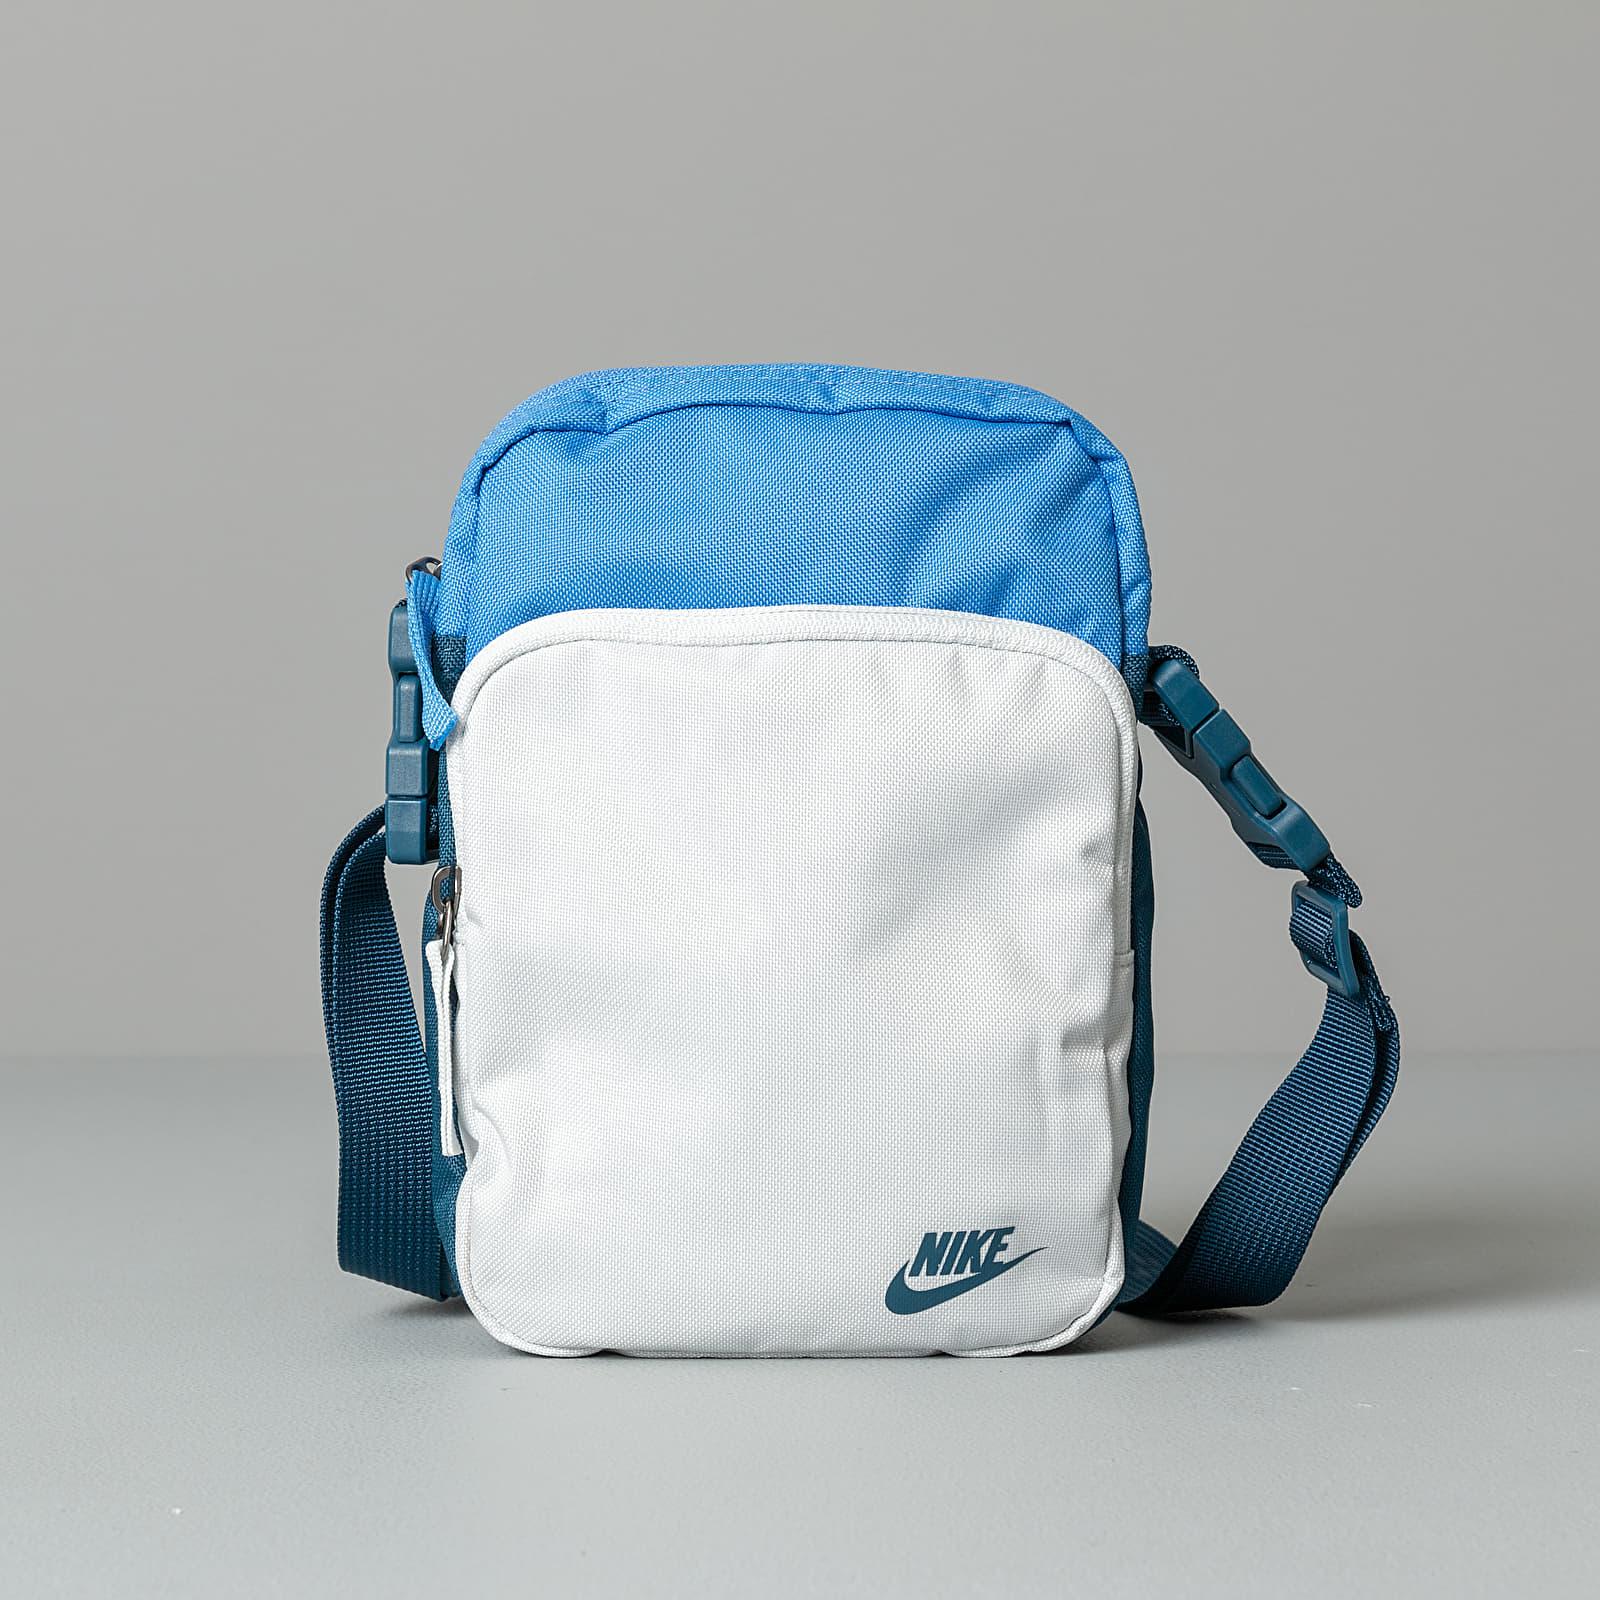 Nike Heritage 2.0 Cross Body Bag